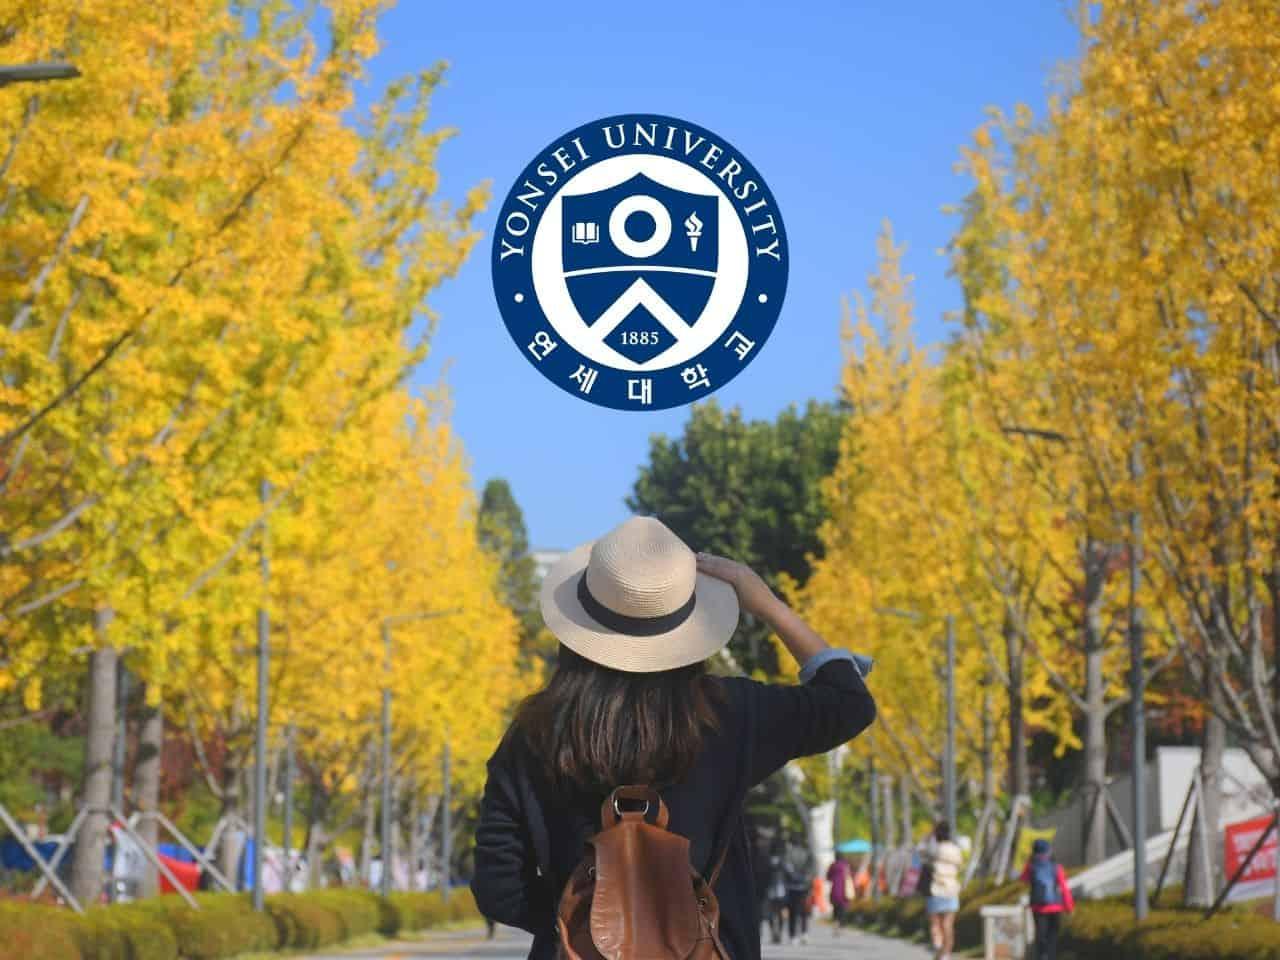 Cursos Gratis Universidad Yonsei Corea